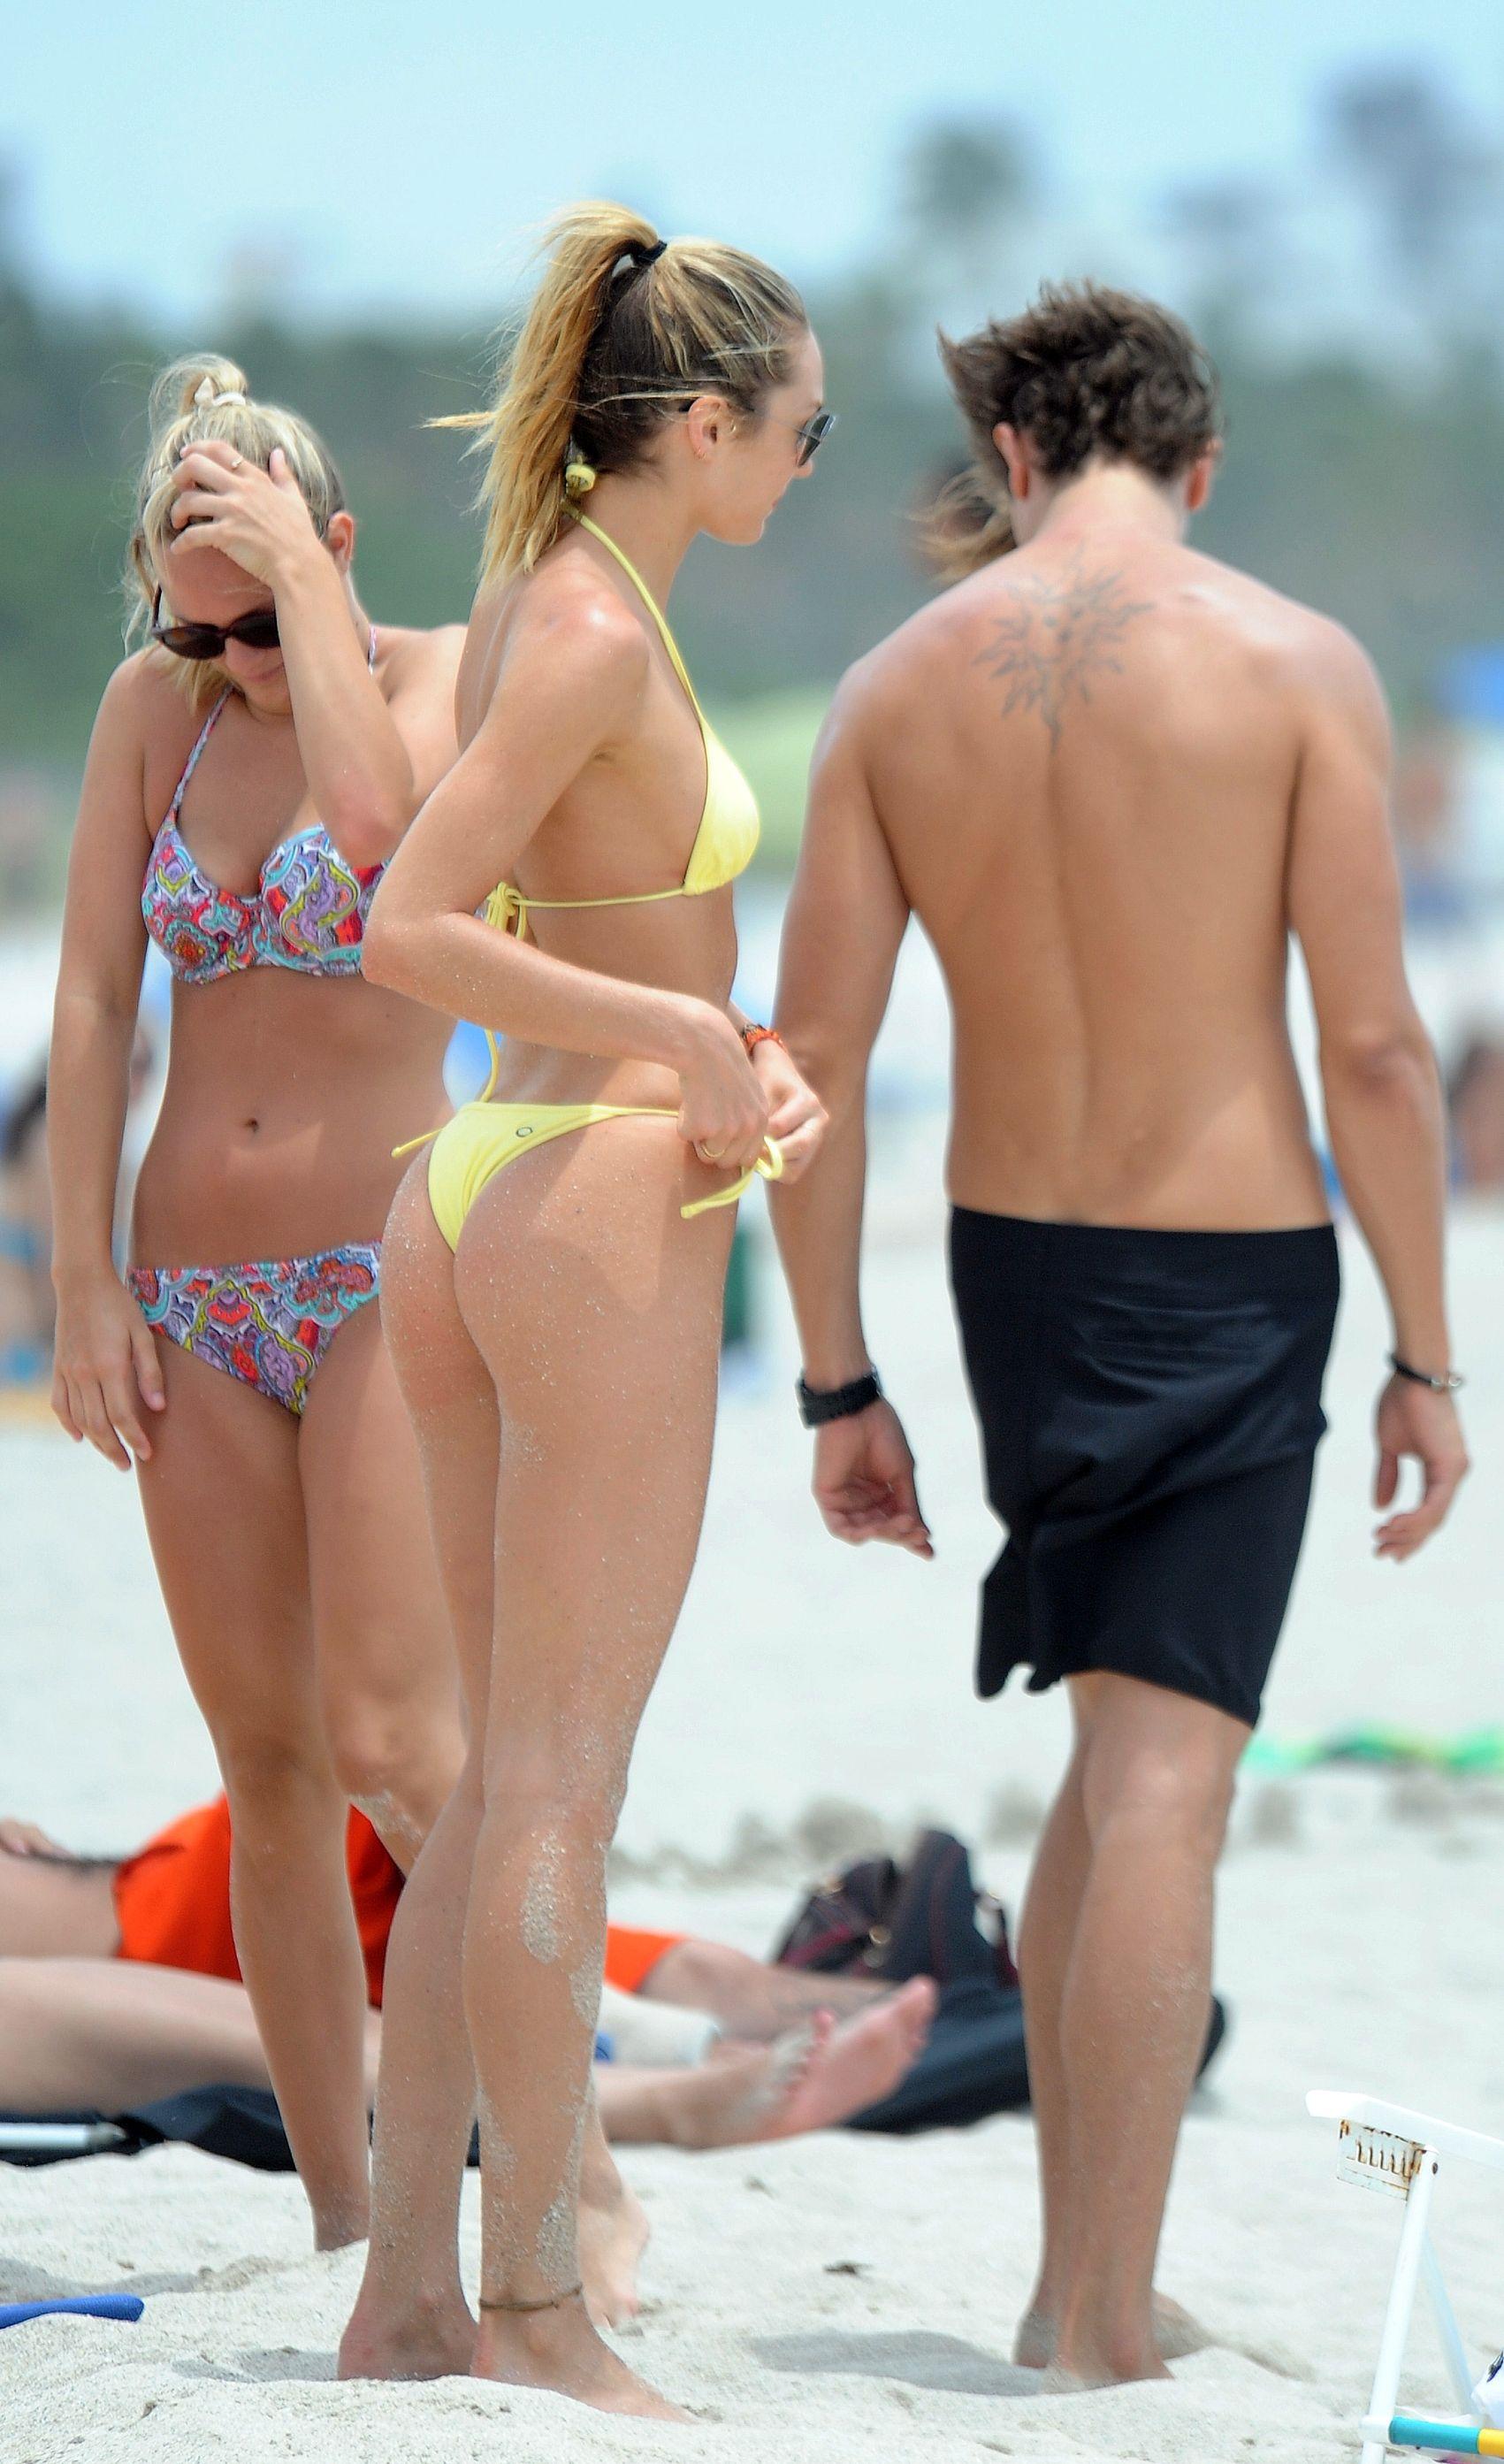 Candice Swanepoel nude boobs